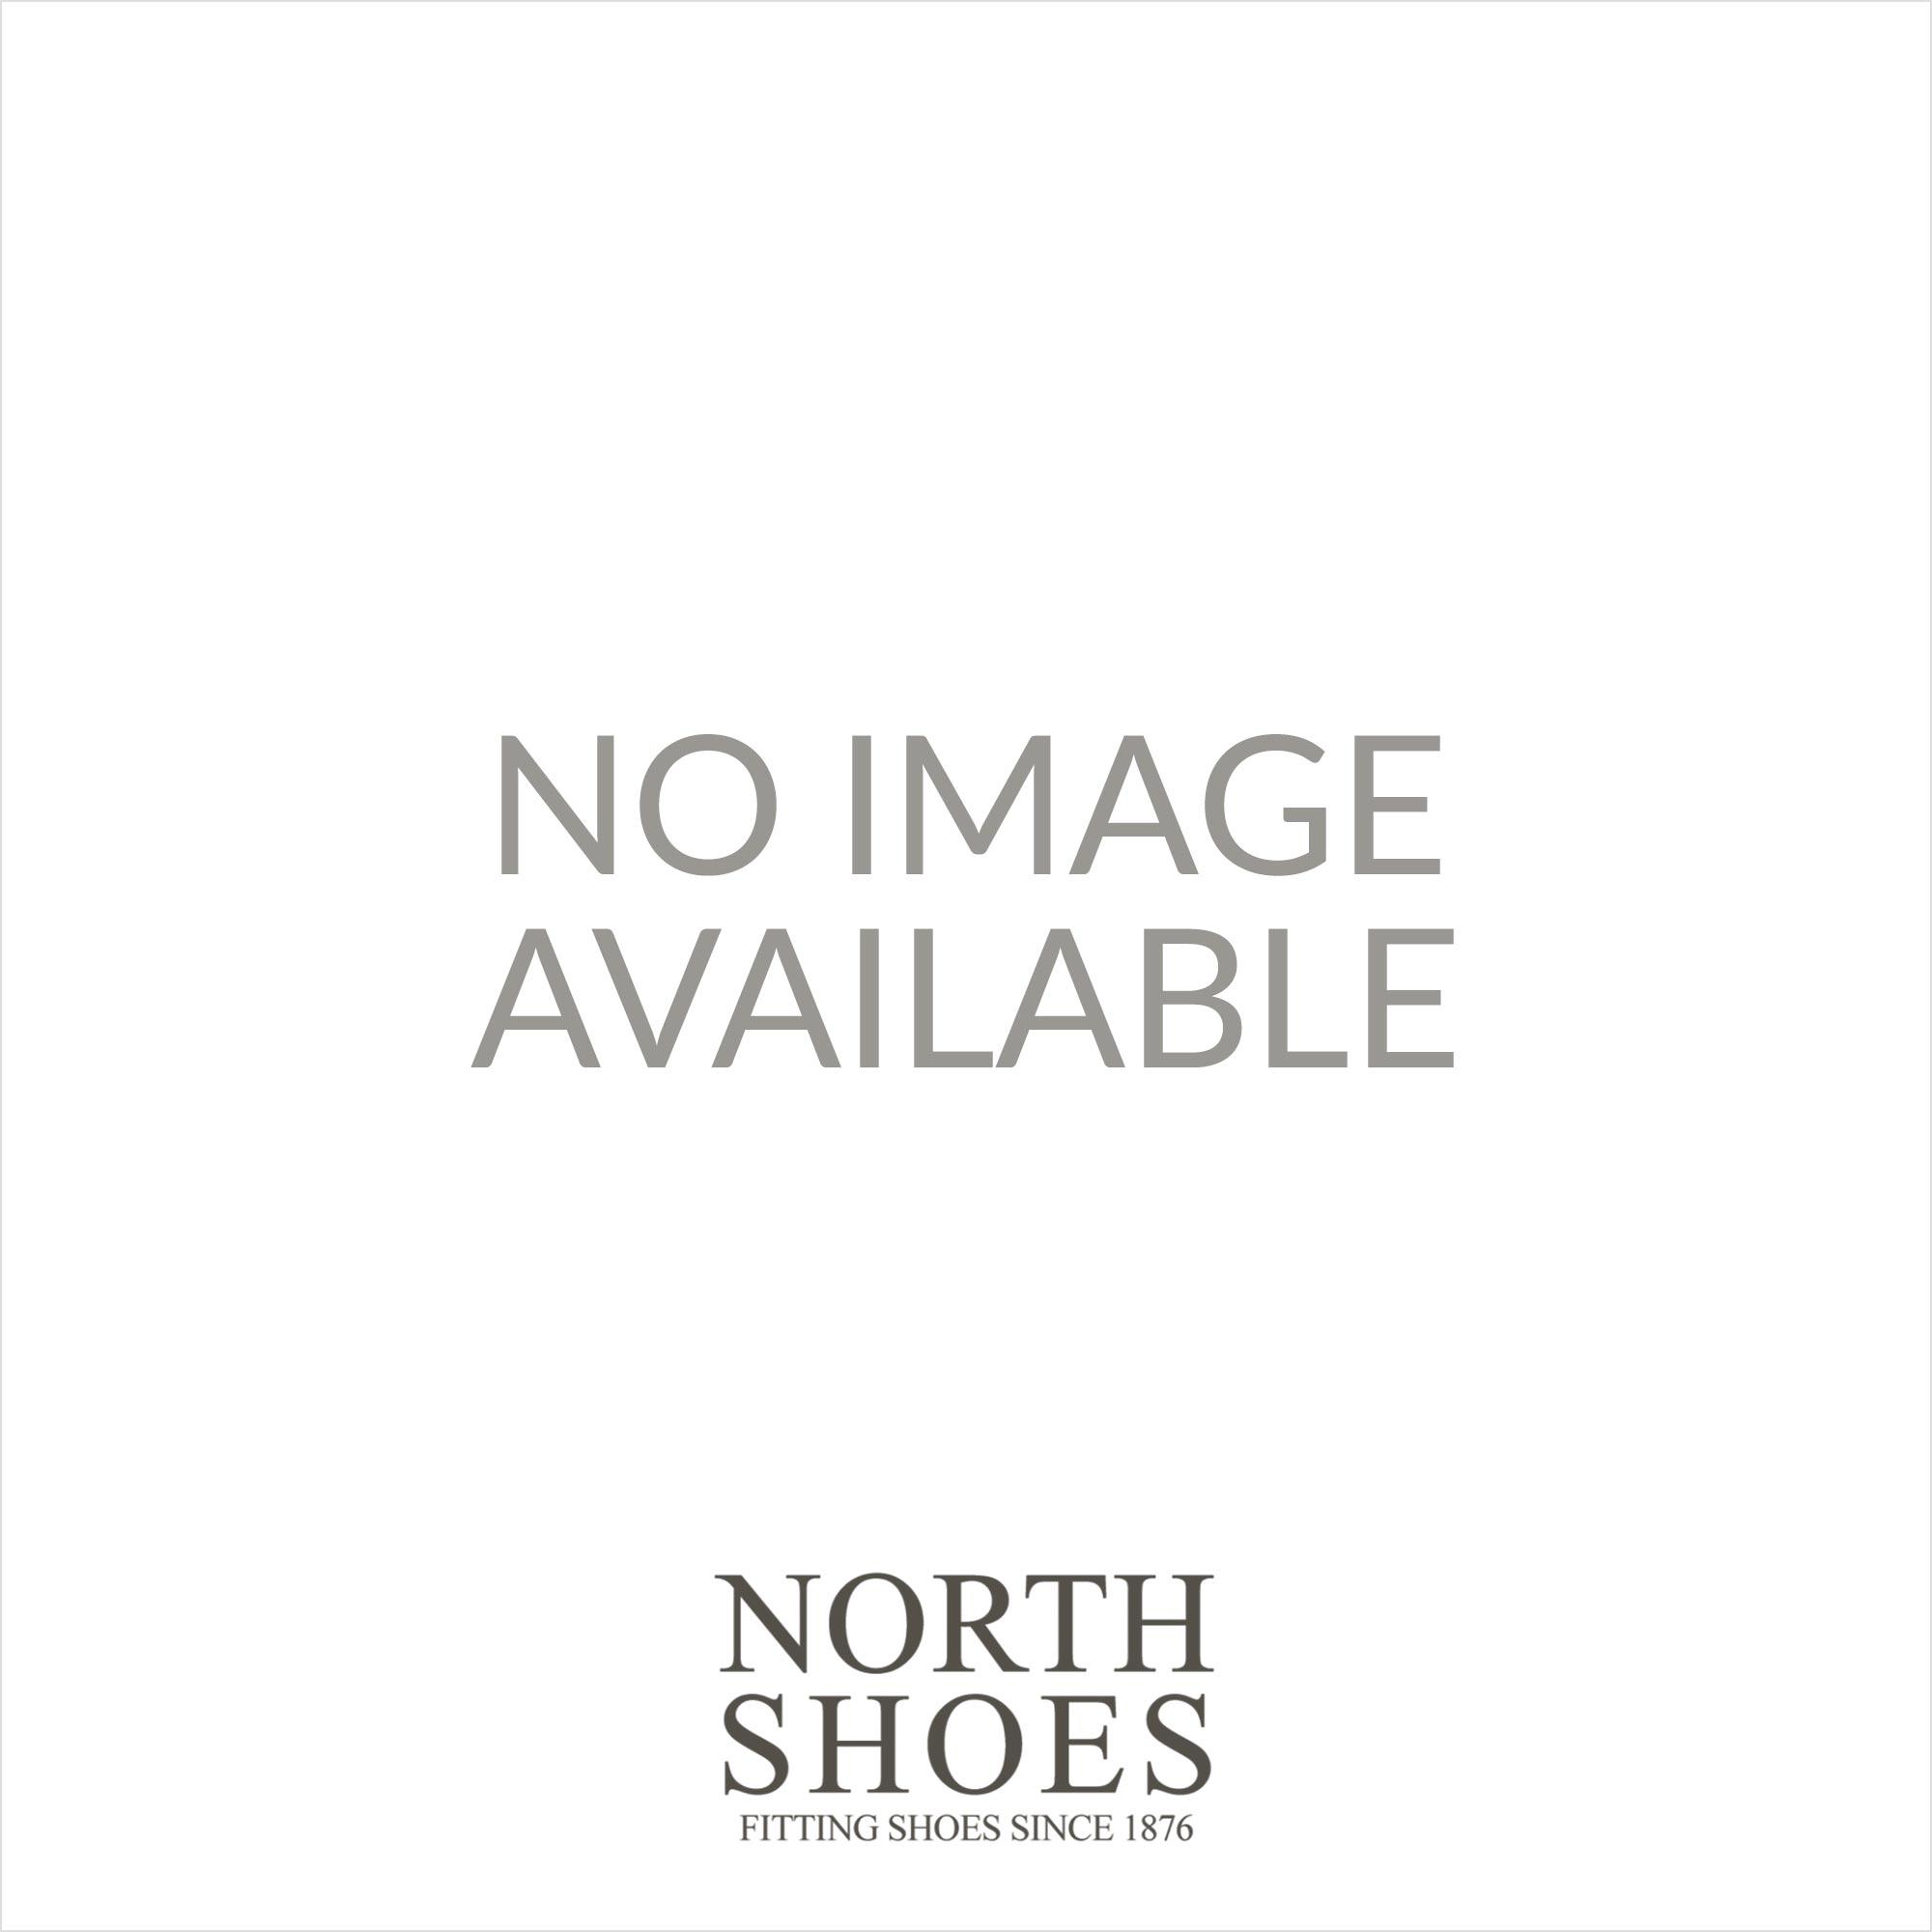 6bce327d56ab 537T1-40 Beige Womens Slip On Wedge Shoes - UK 6½